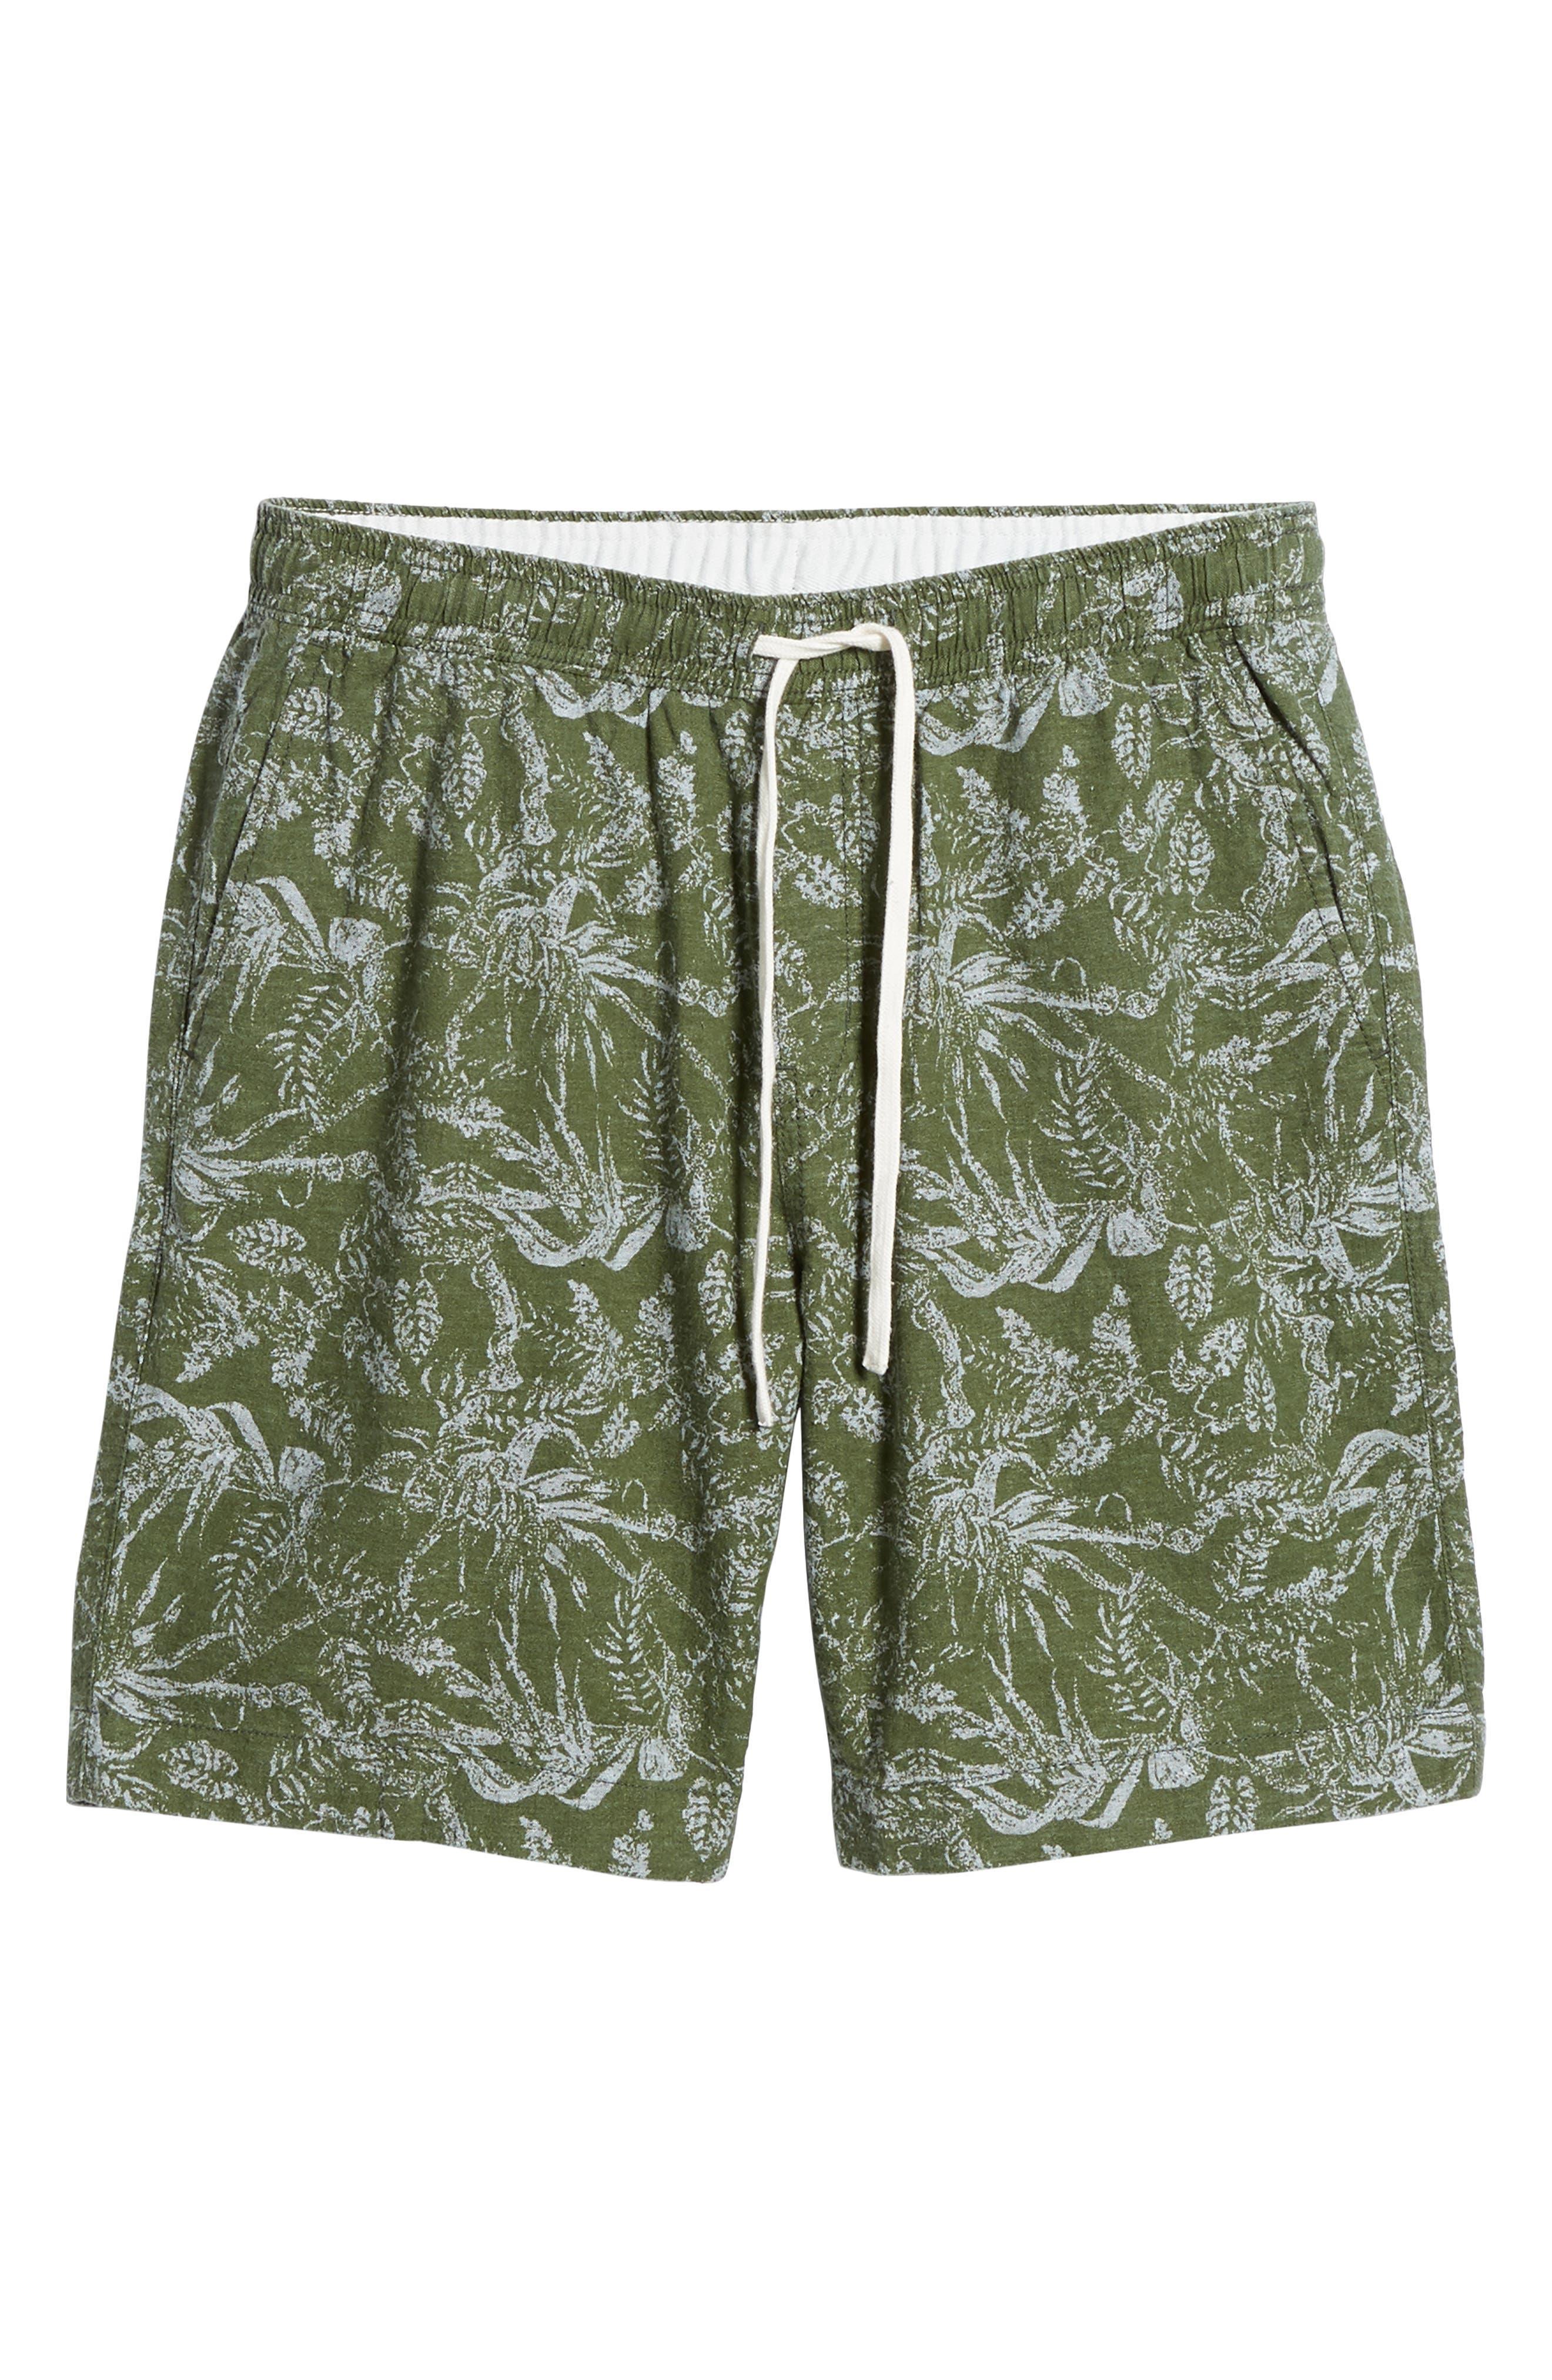 E-Waist Print Linen Blend Shorts,                             Alternate thumbnail 6, color,                             310